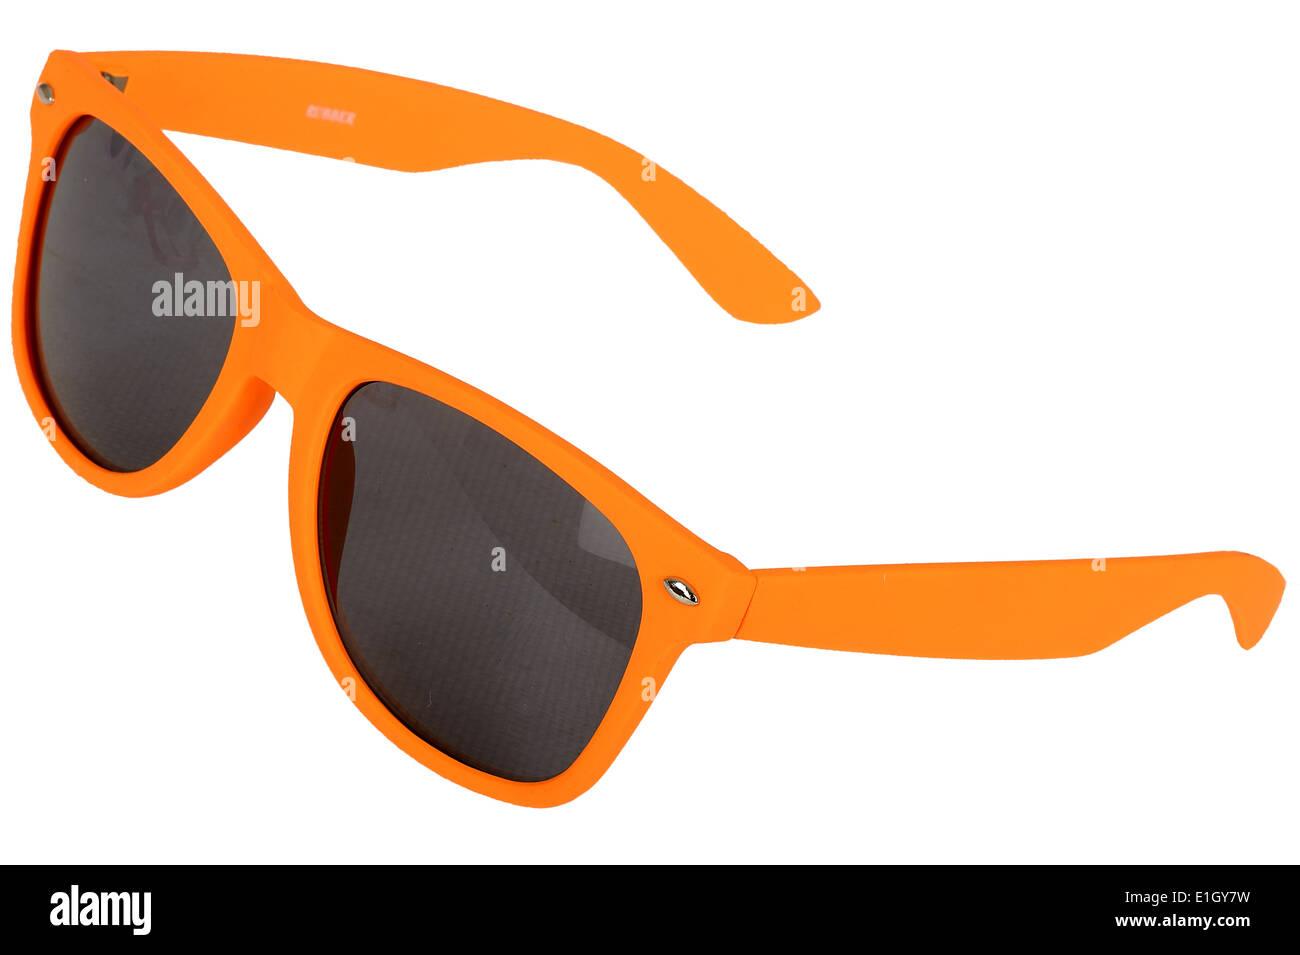 Moda Gafas de sol naranja Imagen De Stock